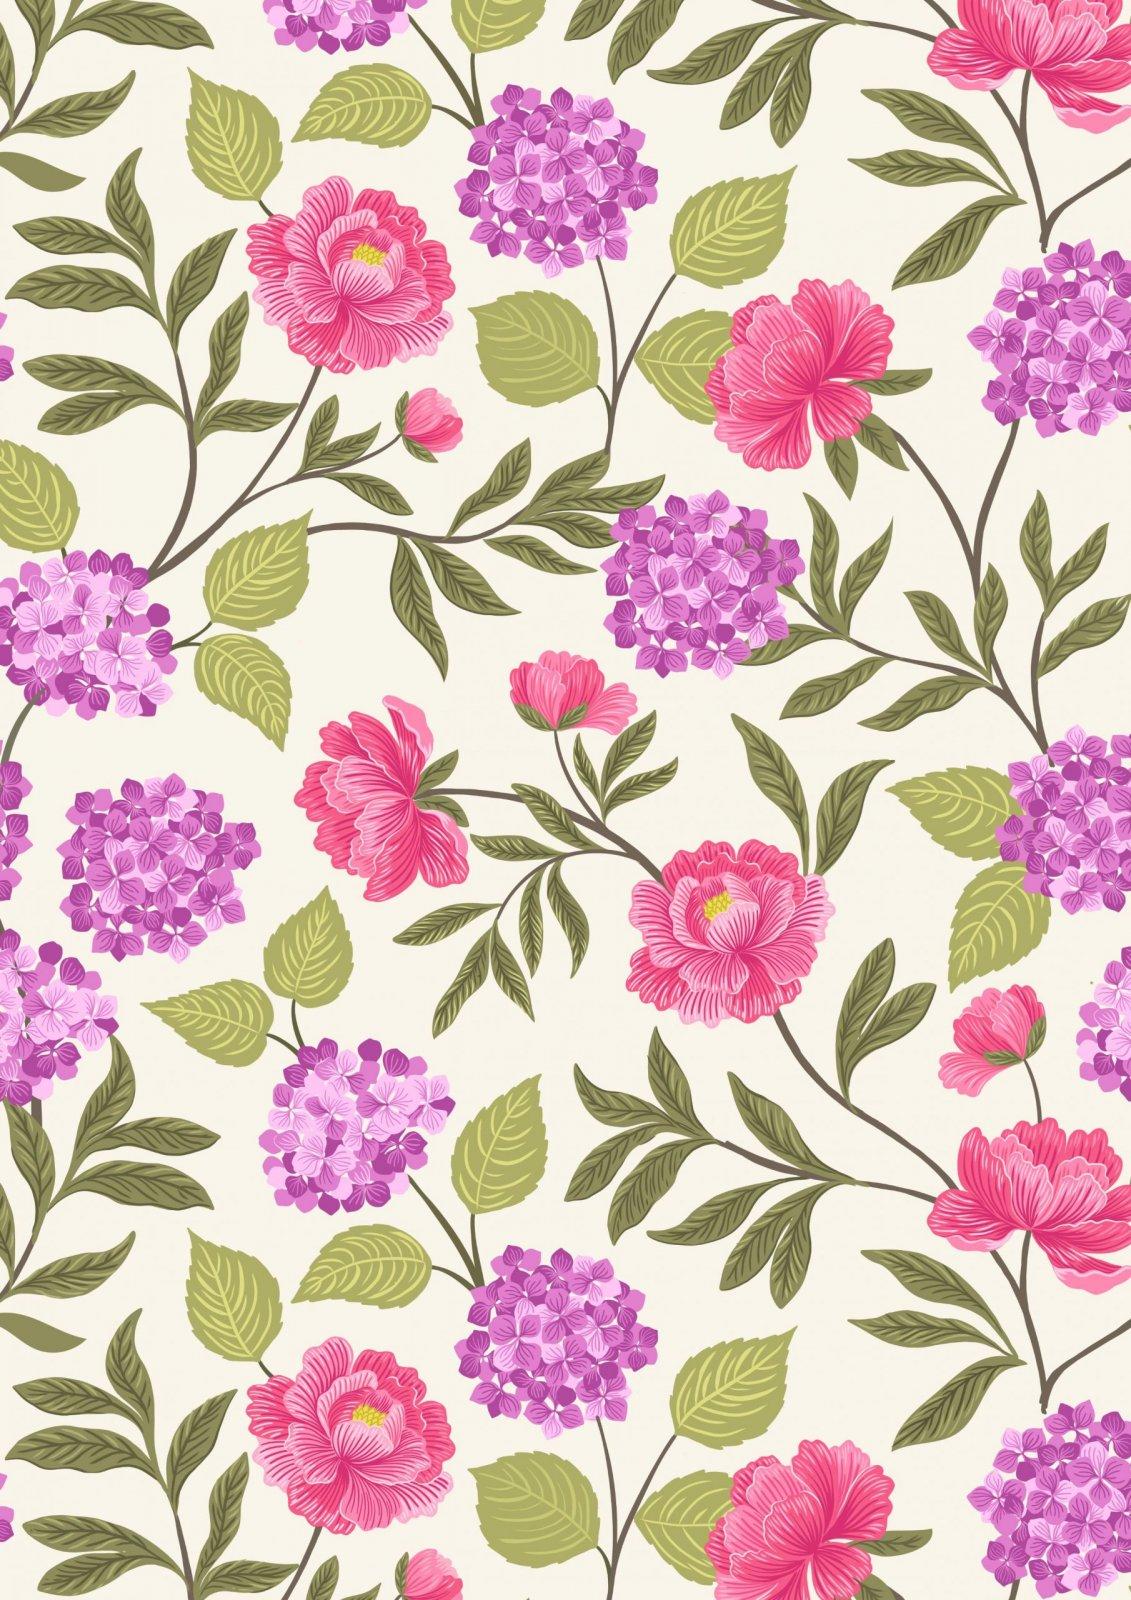 Love Blooms - A521.1 Peonies & Hydrangea on Cream